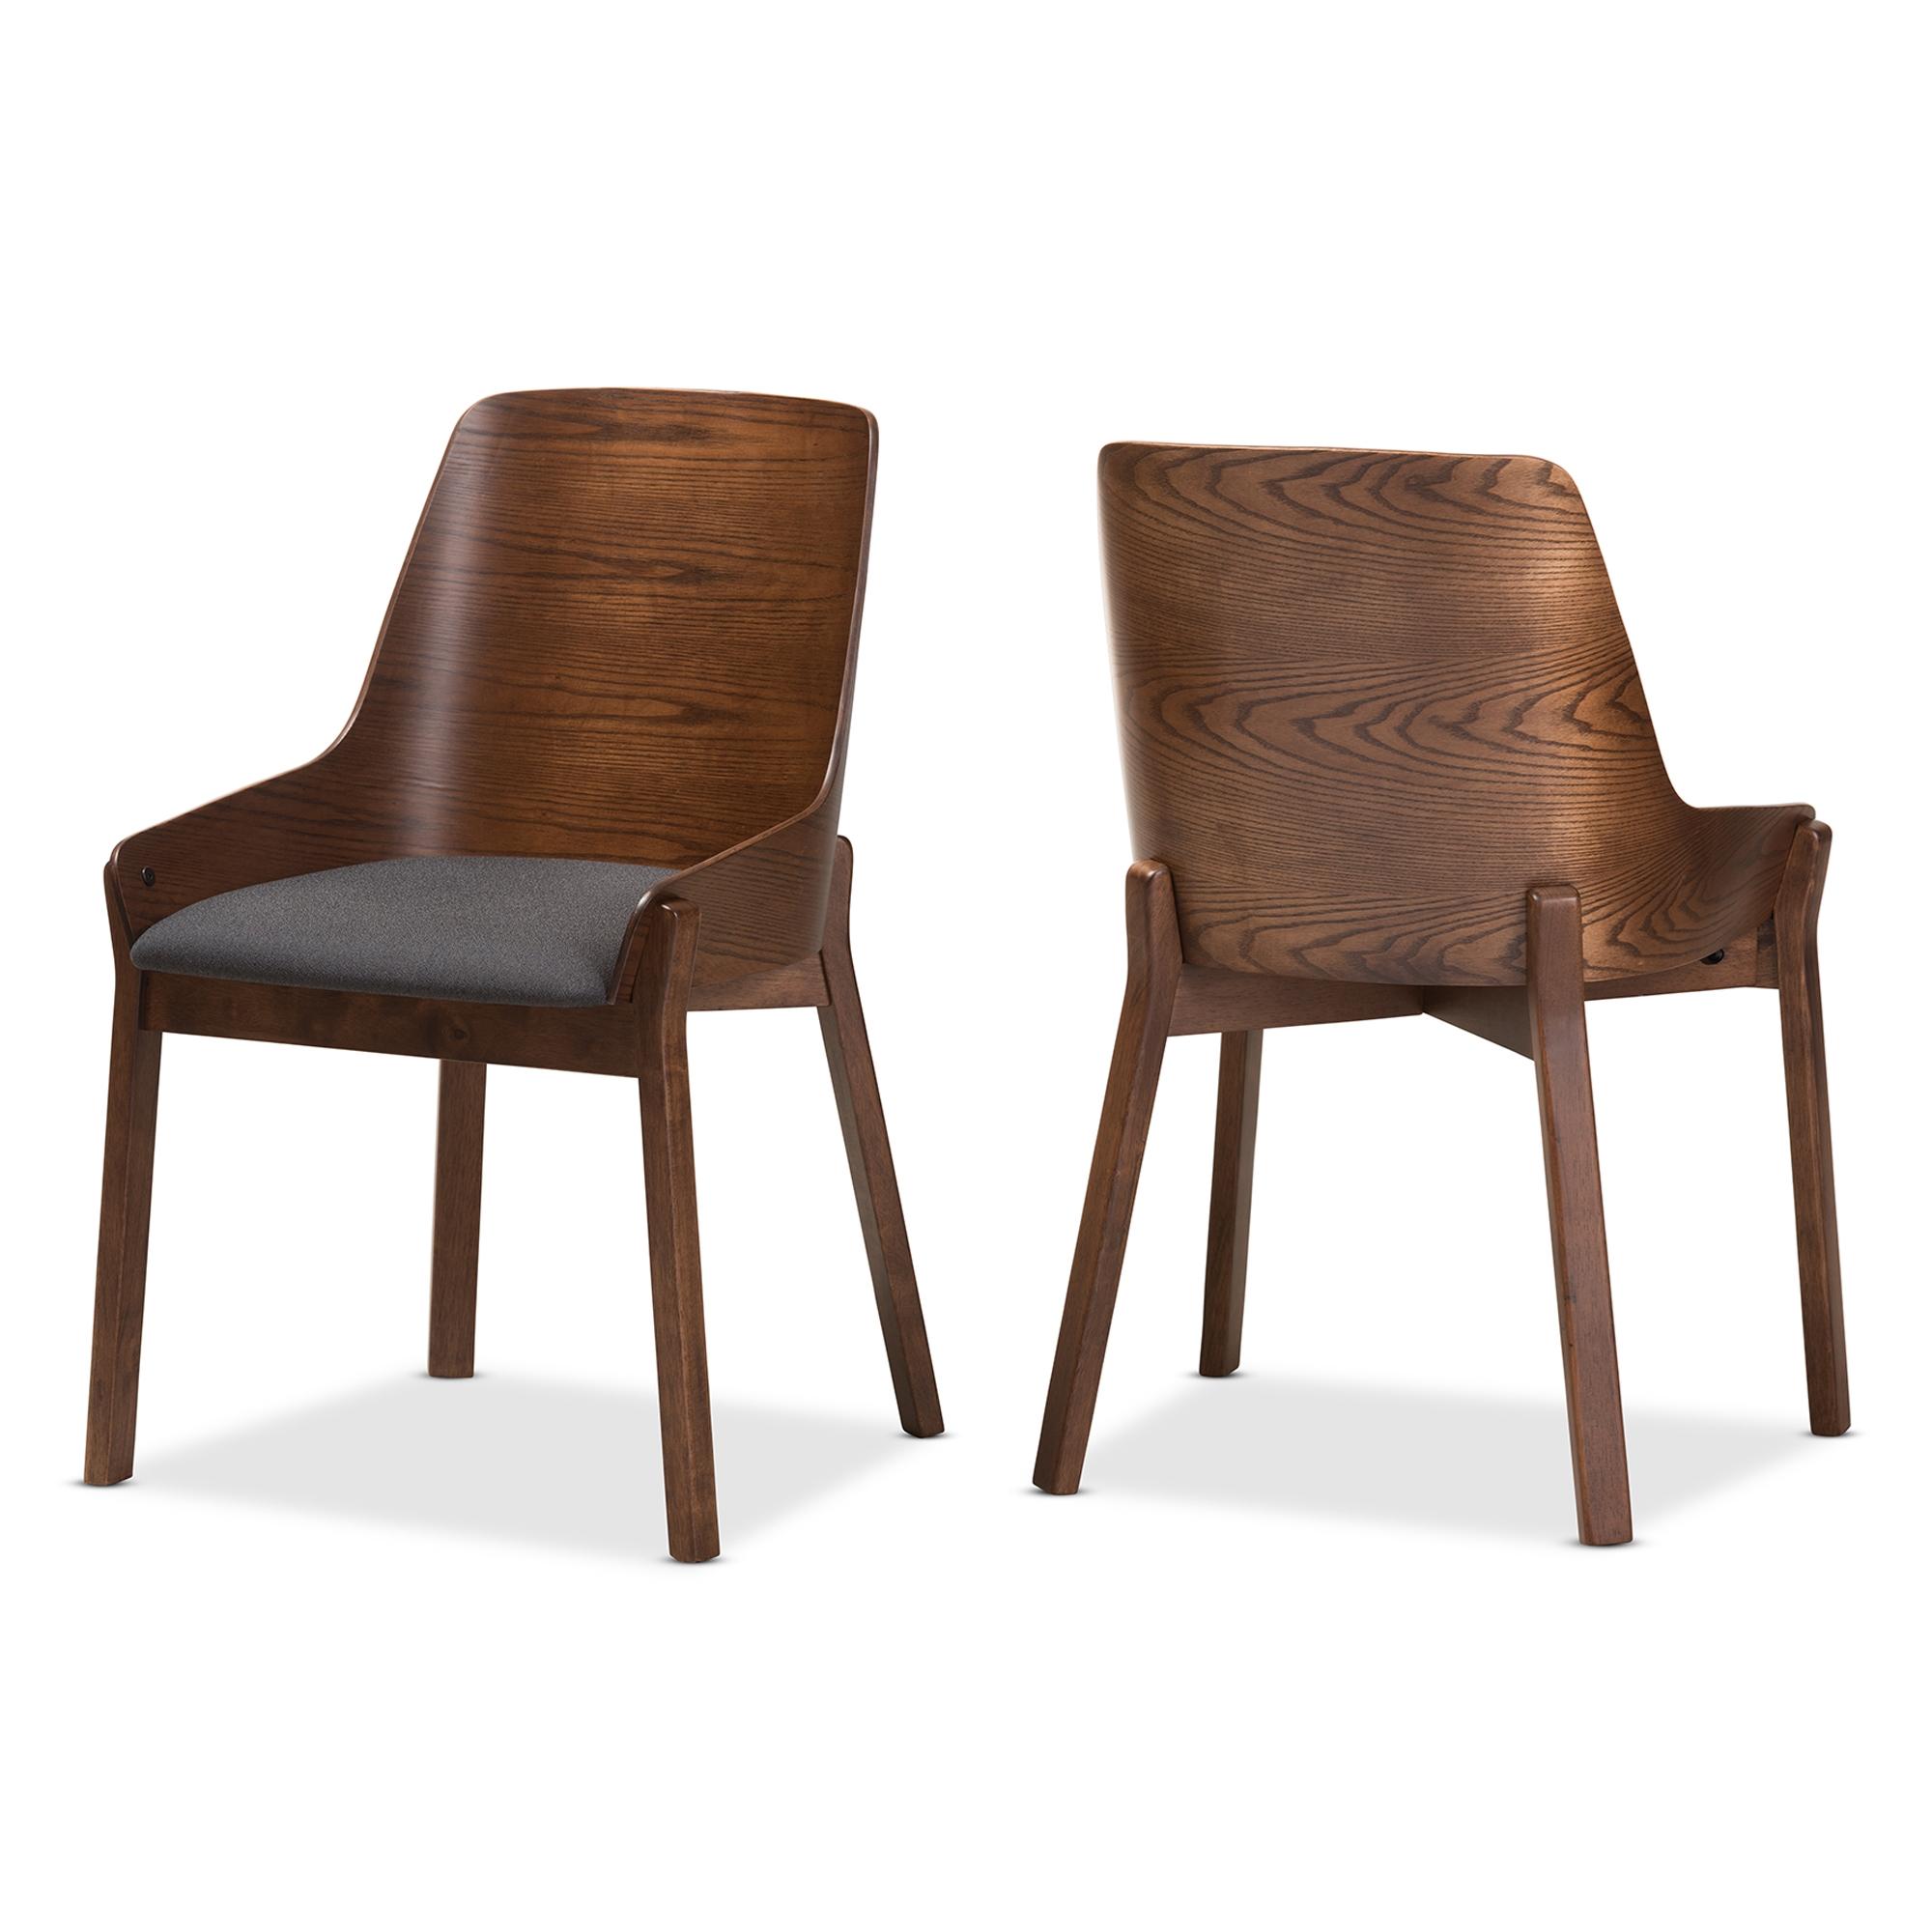 Charming Baxton Studio Rye Mid Century Modern Walnut Wood Dark Grey Fabric Dining  Chair Set Of 2